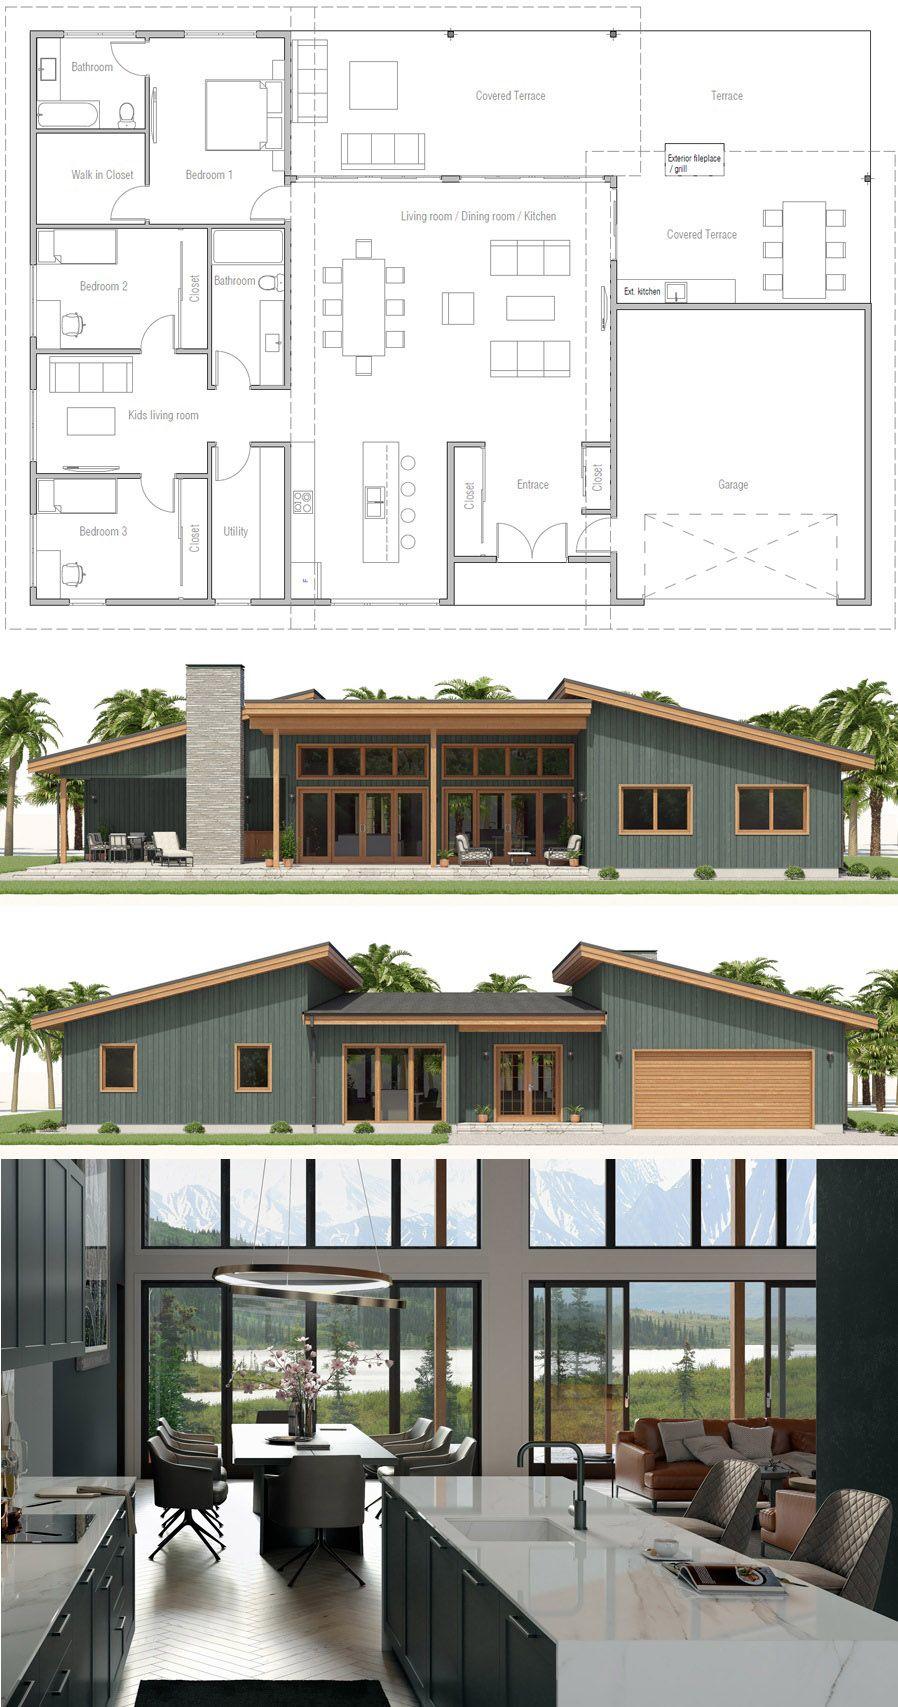 Modern House Plan #modernhome #modernhouseplans #housedesign #houseplans #newhomes